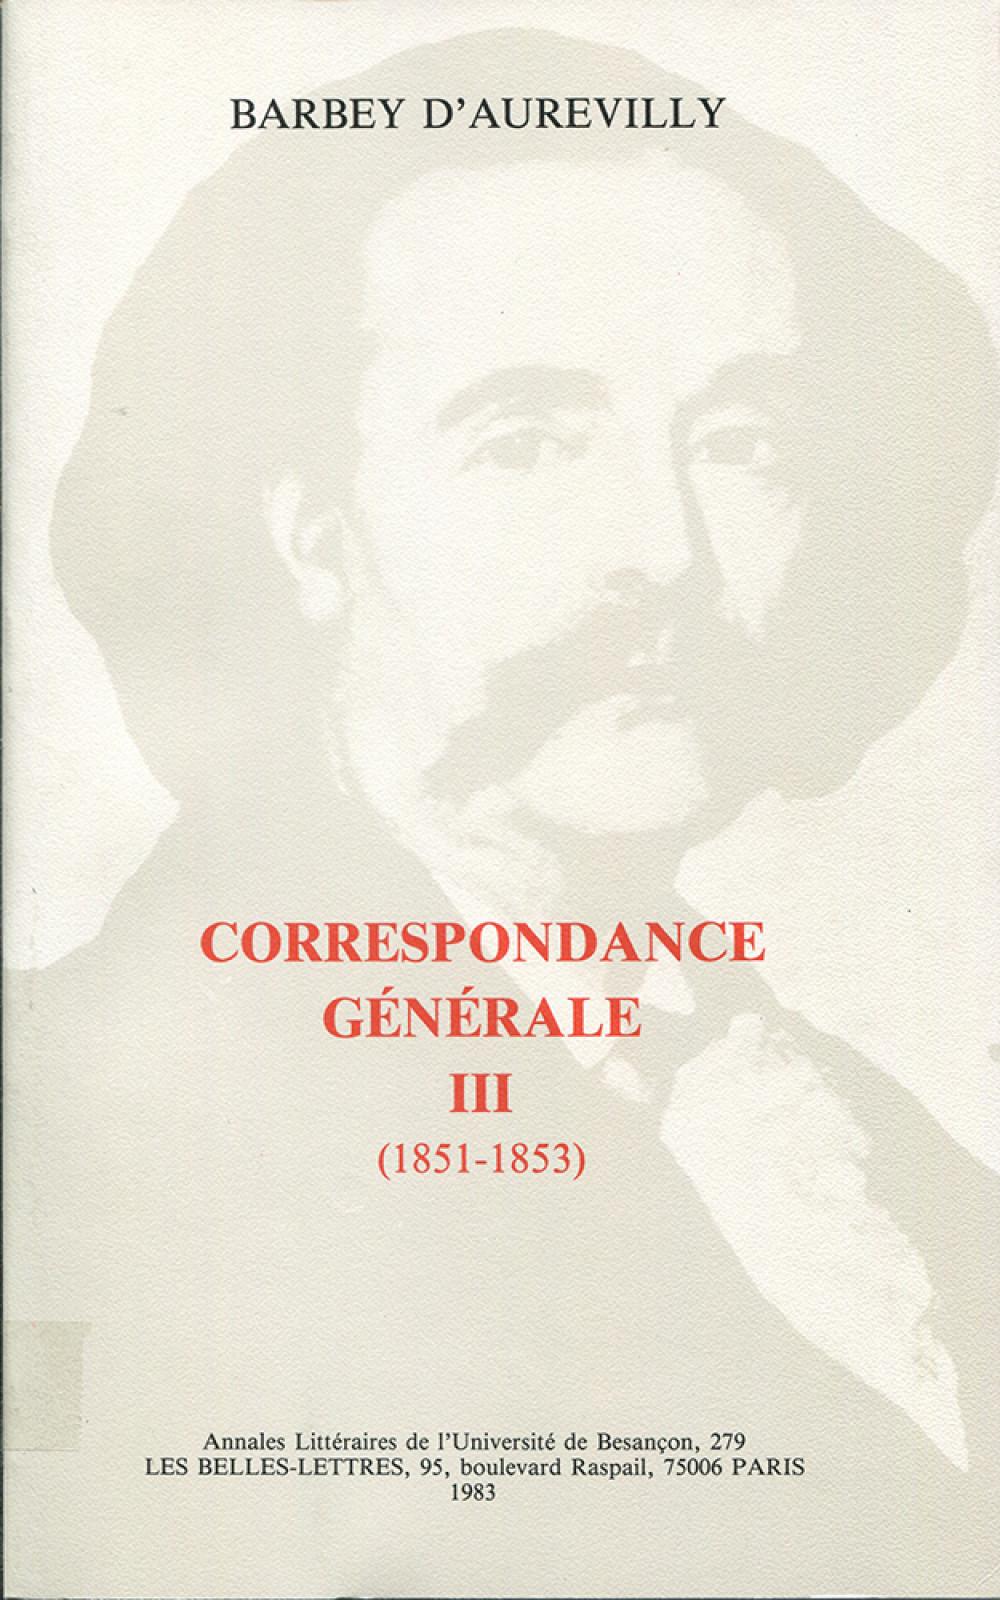 Barbey d'Aurevilly. Correespondance générale III (1851-1853)